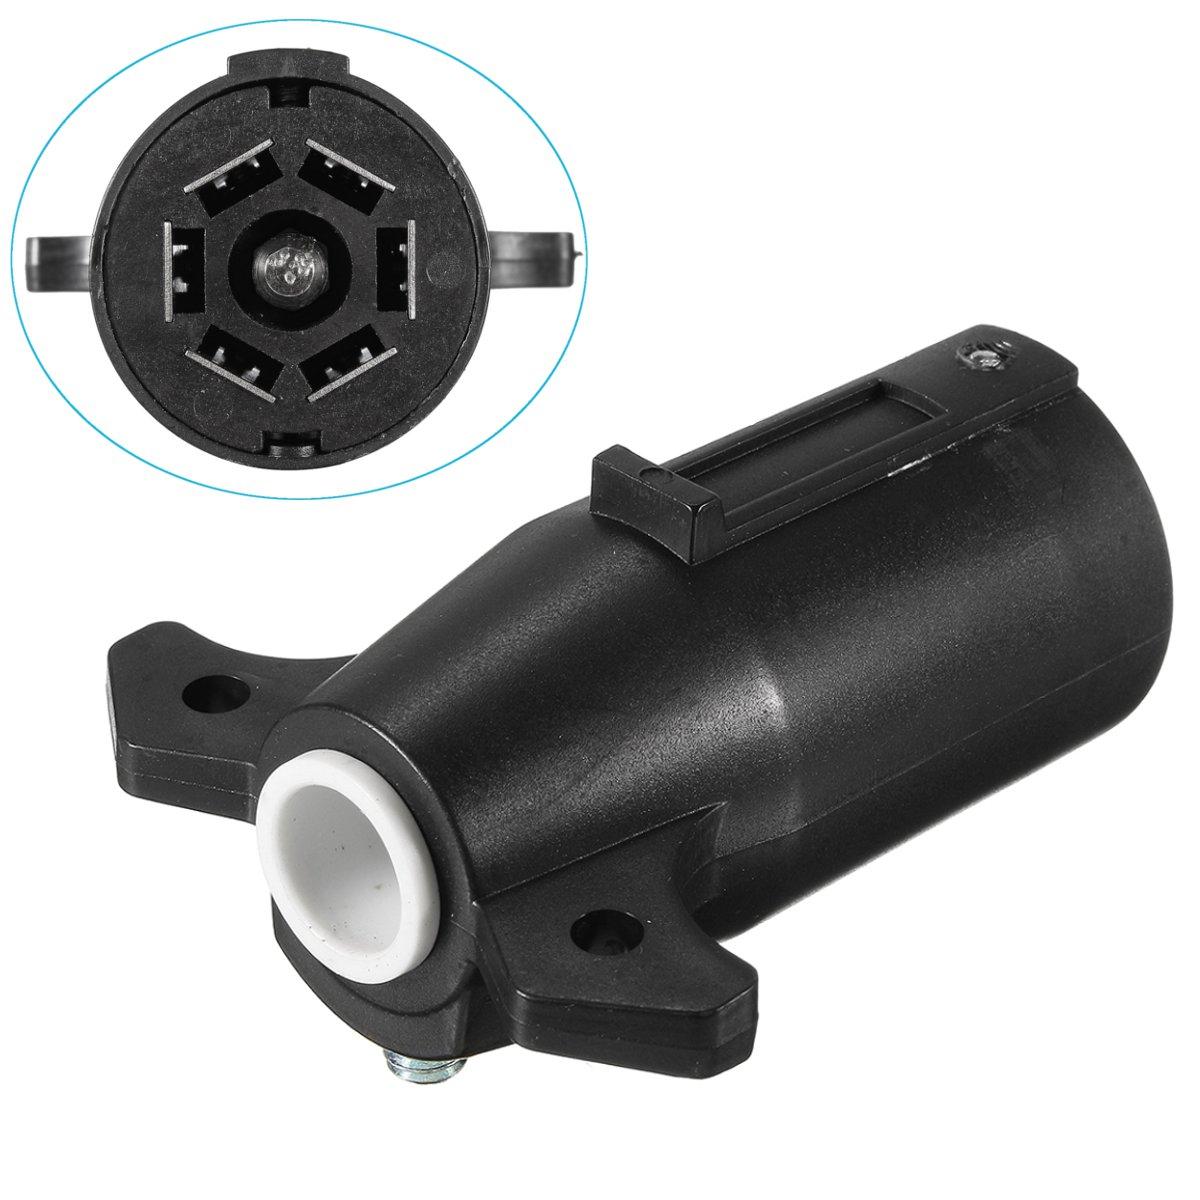 Round Trailer Plug Adapter On 4 Pin Round Trailer Wiring Connector